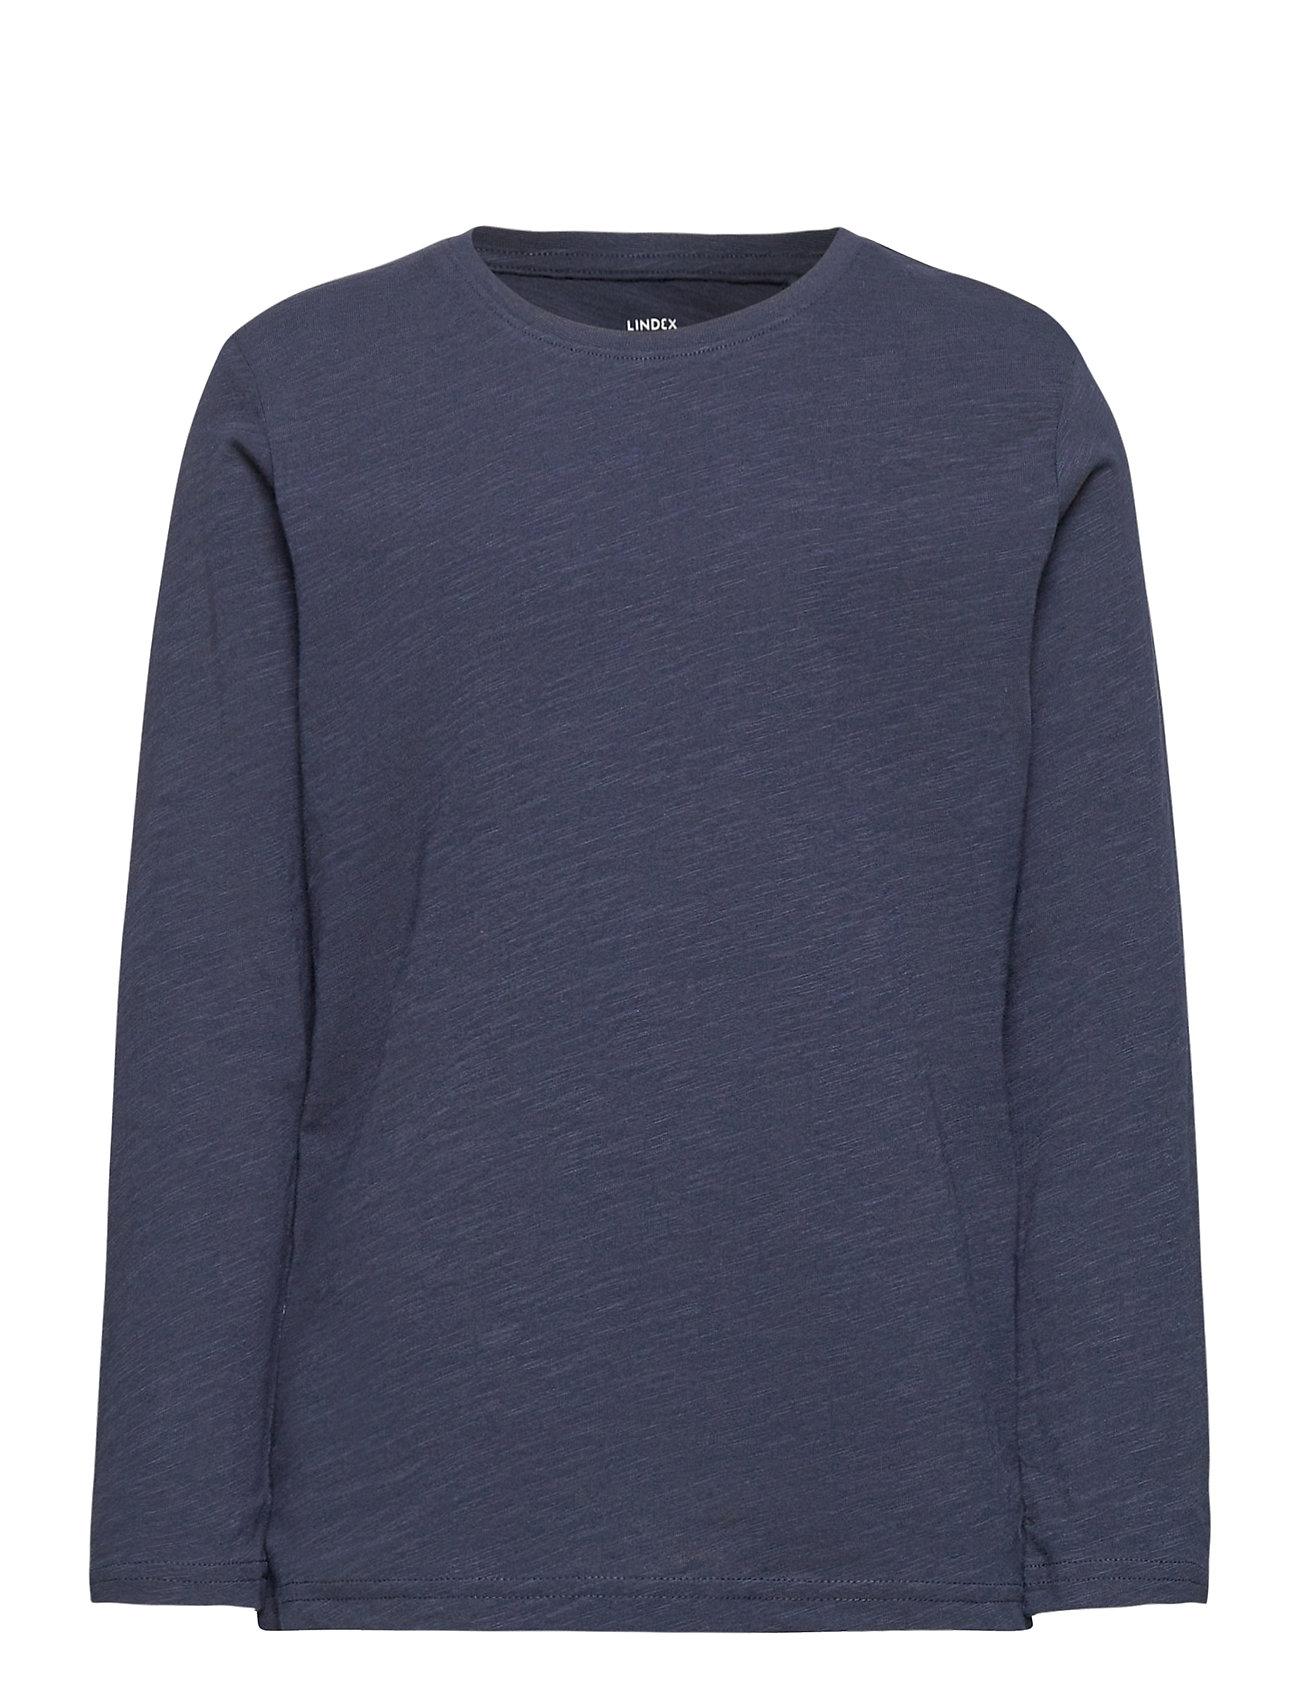 Top Ls Basic Slub Langærmet T-shirt Blå Lindex